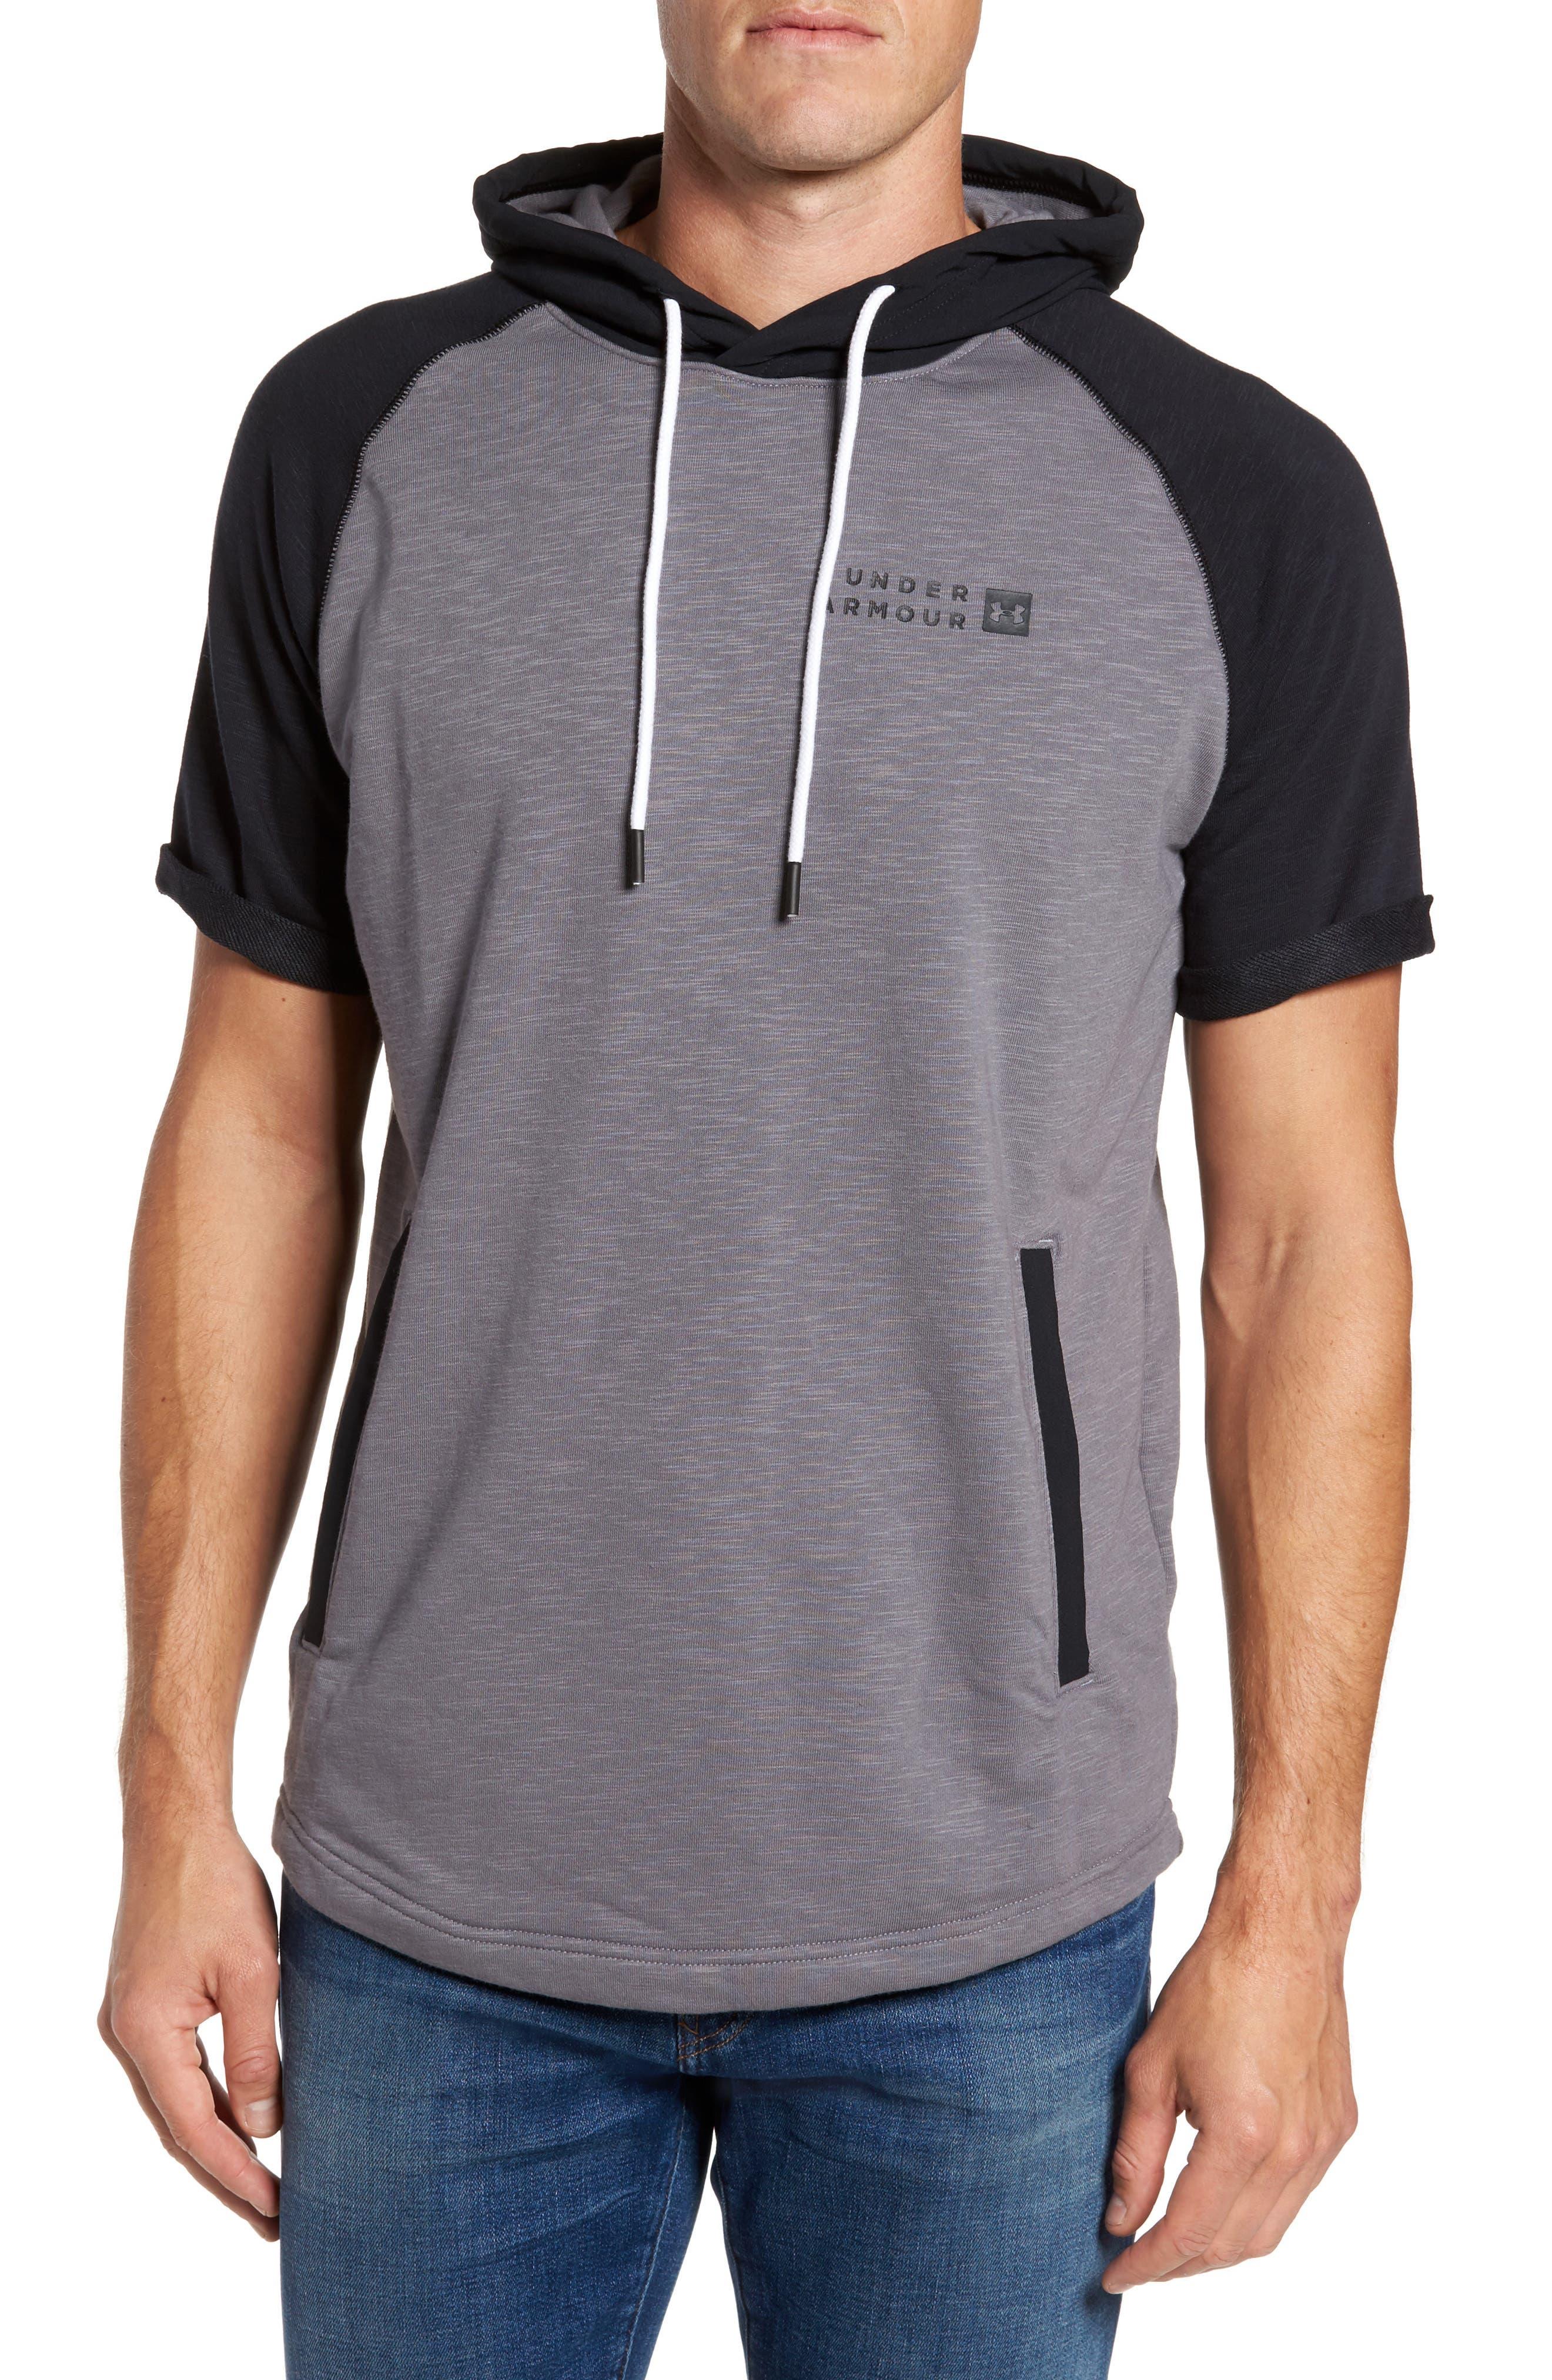 Sportstyle Short Sleeve Hoodie,                         Main,                         color, True Gray Heather / Black